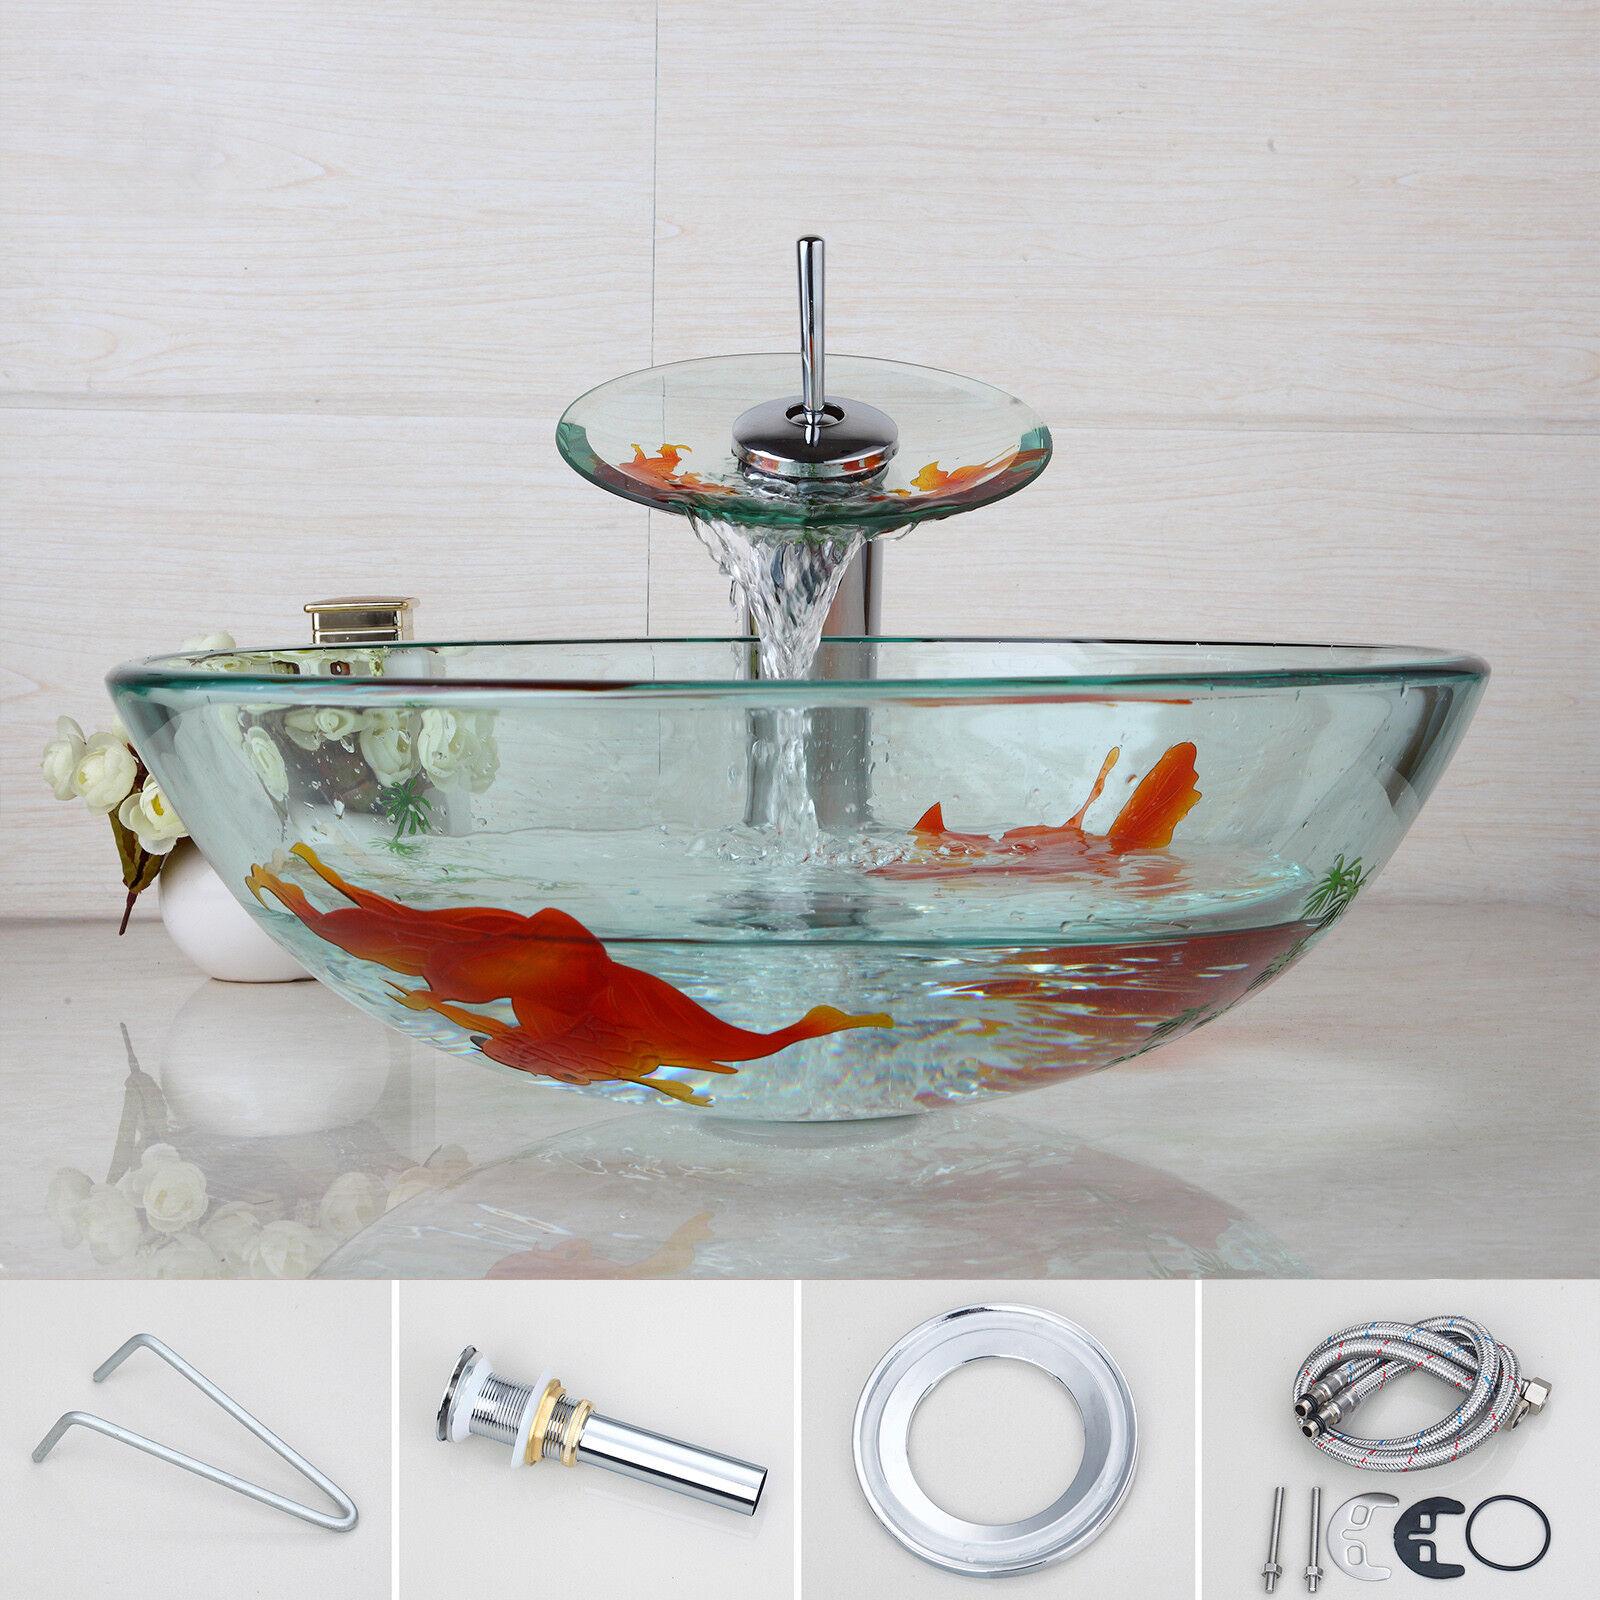 Salle de bain orFISH ronde main peinture verre évier Bol cascade chrome Mitigeur robinets